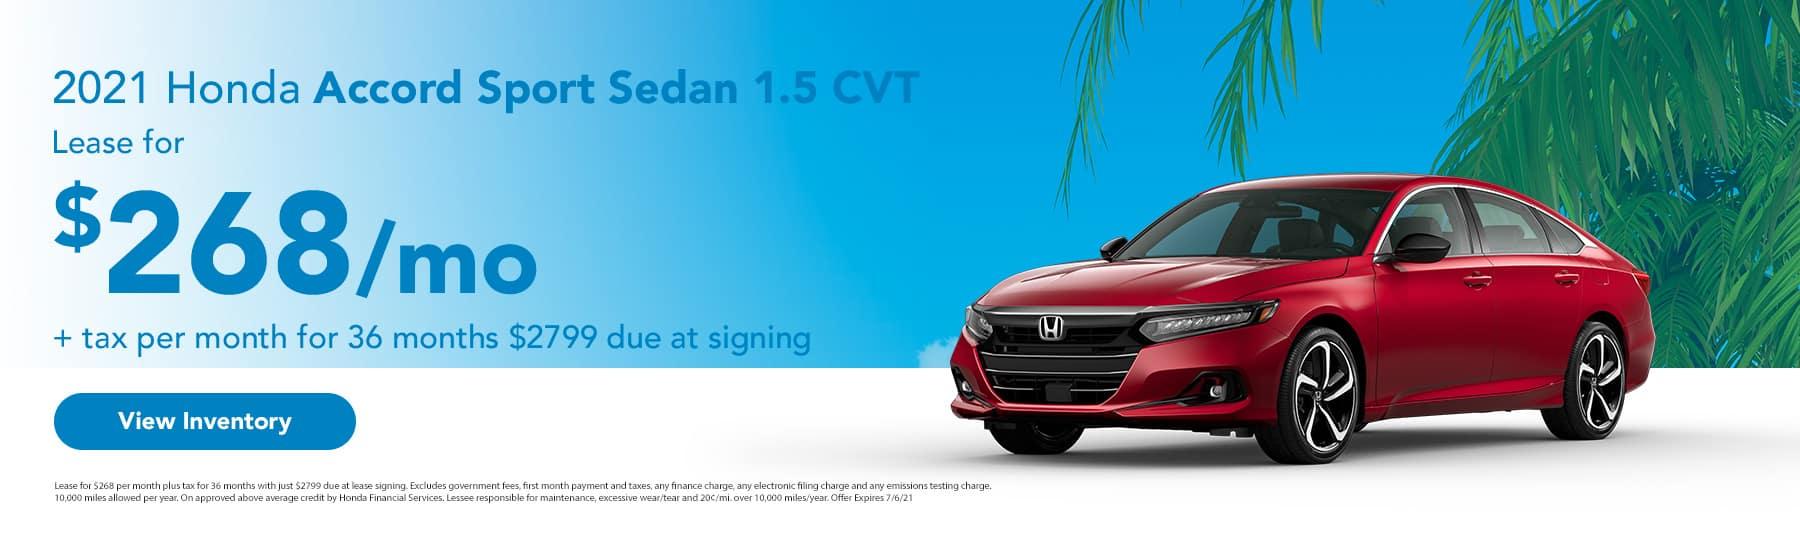 2021 Honda Accord Sport Sedan 1.5 CVT Lease for $268 + tax per month for 36 months